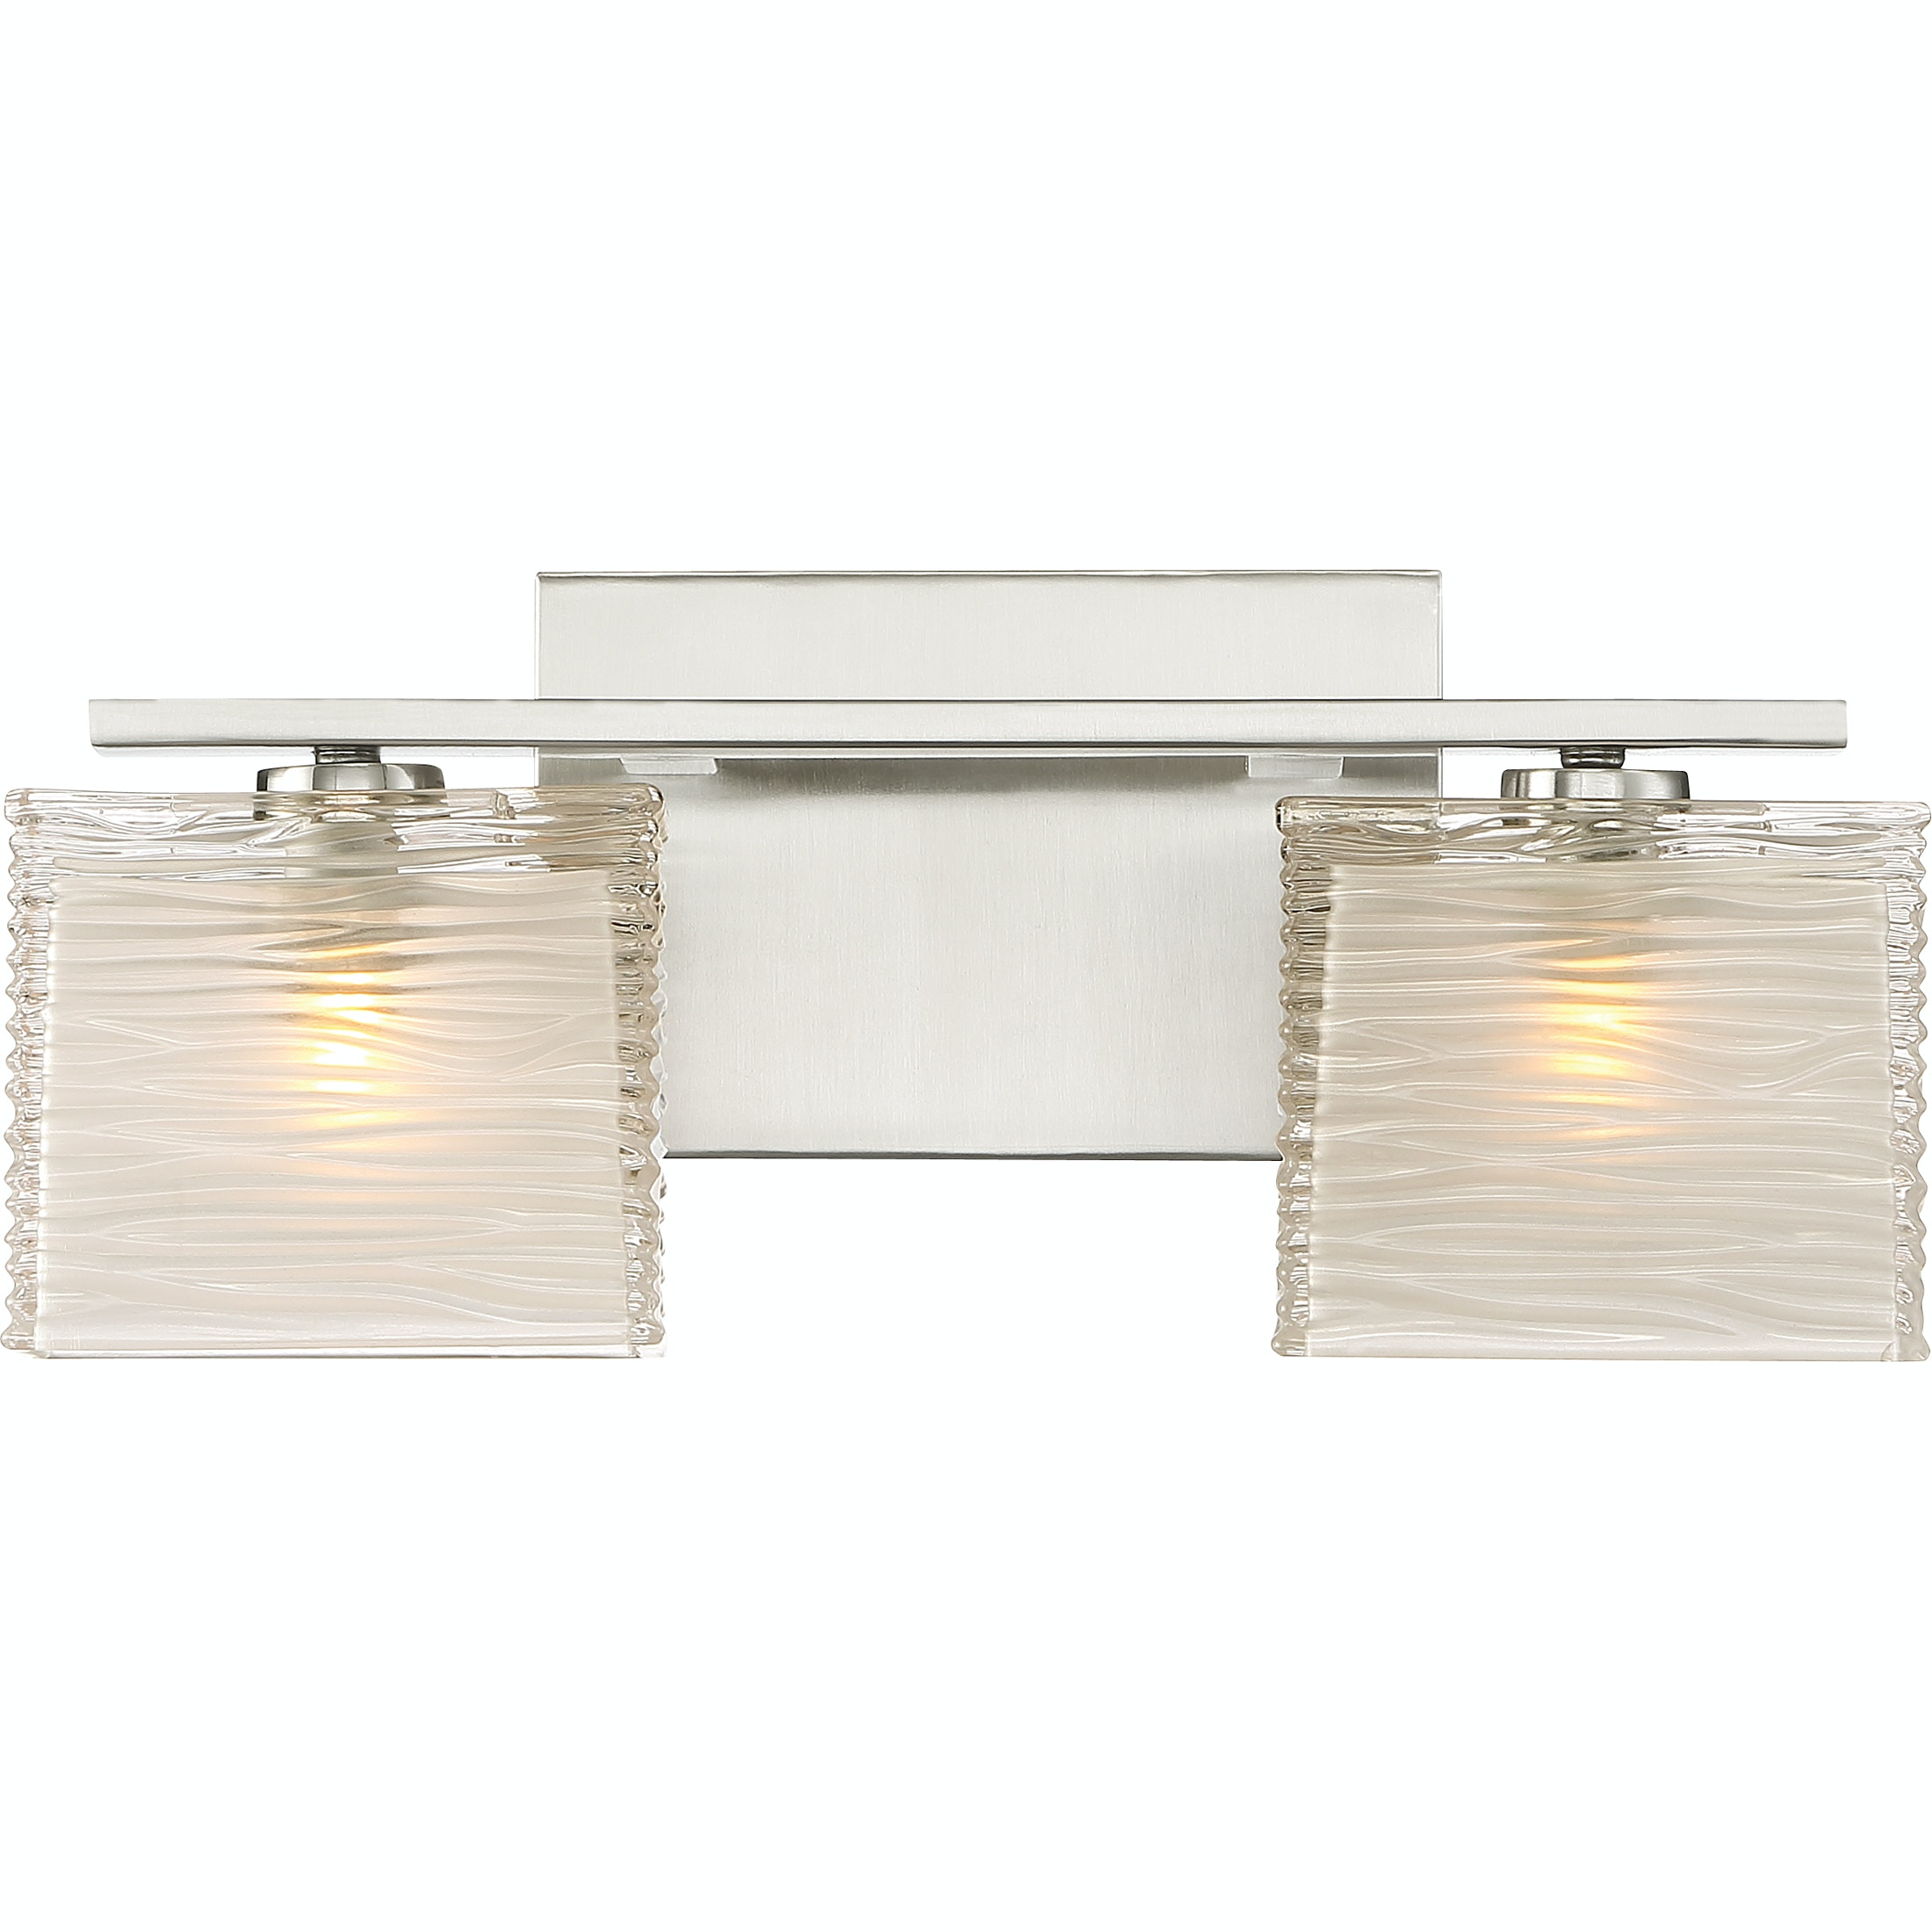 quoizel bathroom lighting 20 inch quoizel bath light wcp8602bnled wcp8602bnled interiors camp hill lancaster